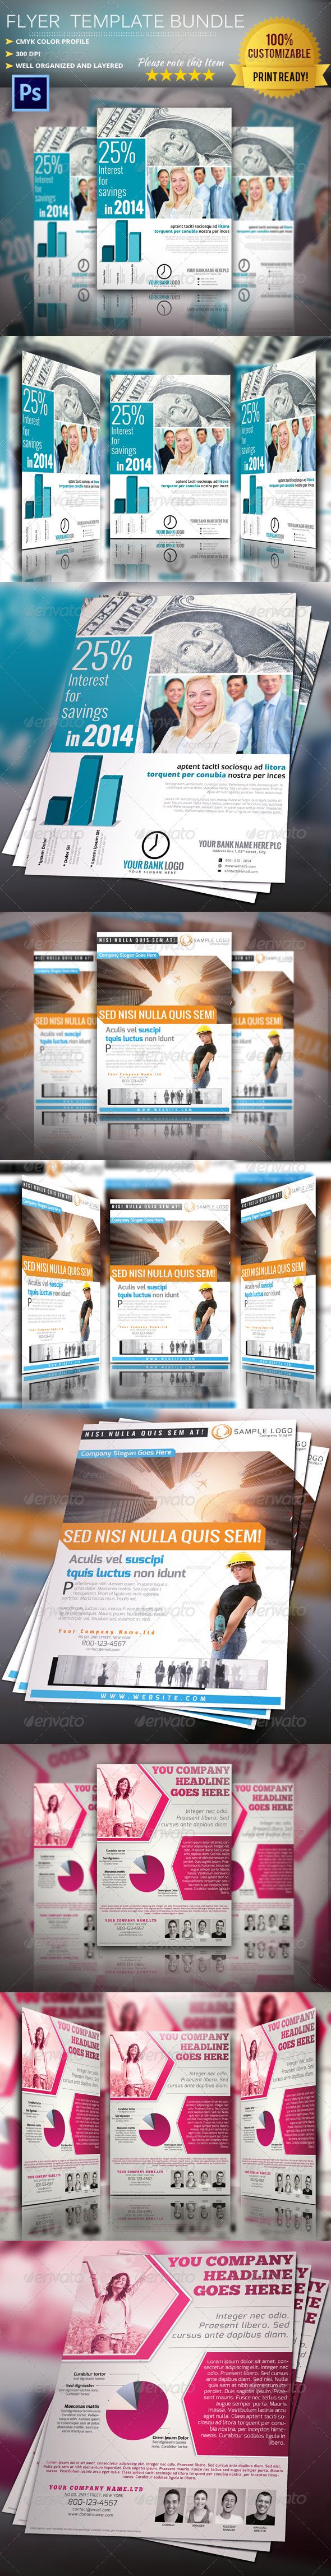 Flyer/Poster Bundle Vol.4 - Corporate Flyers